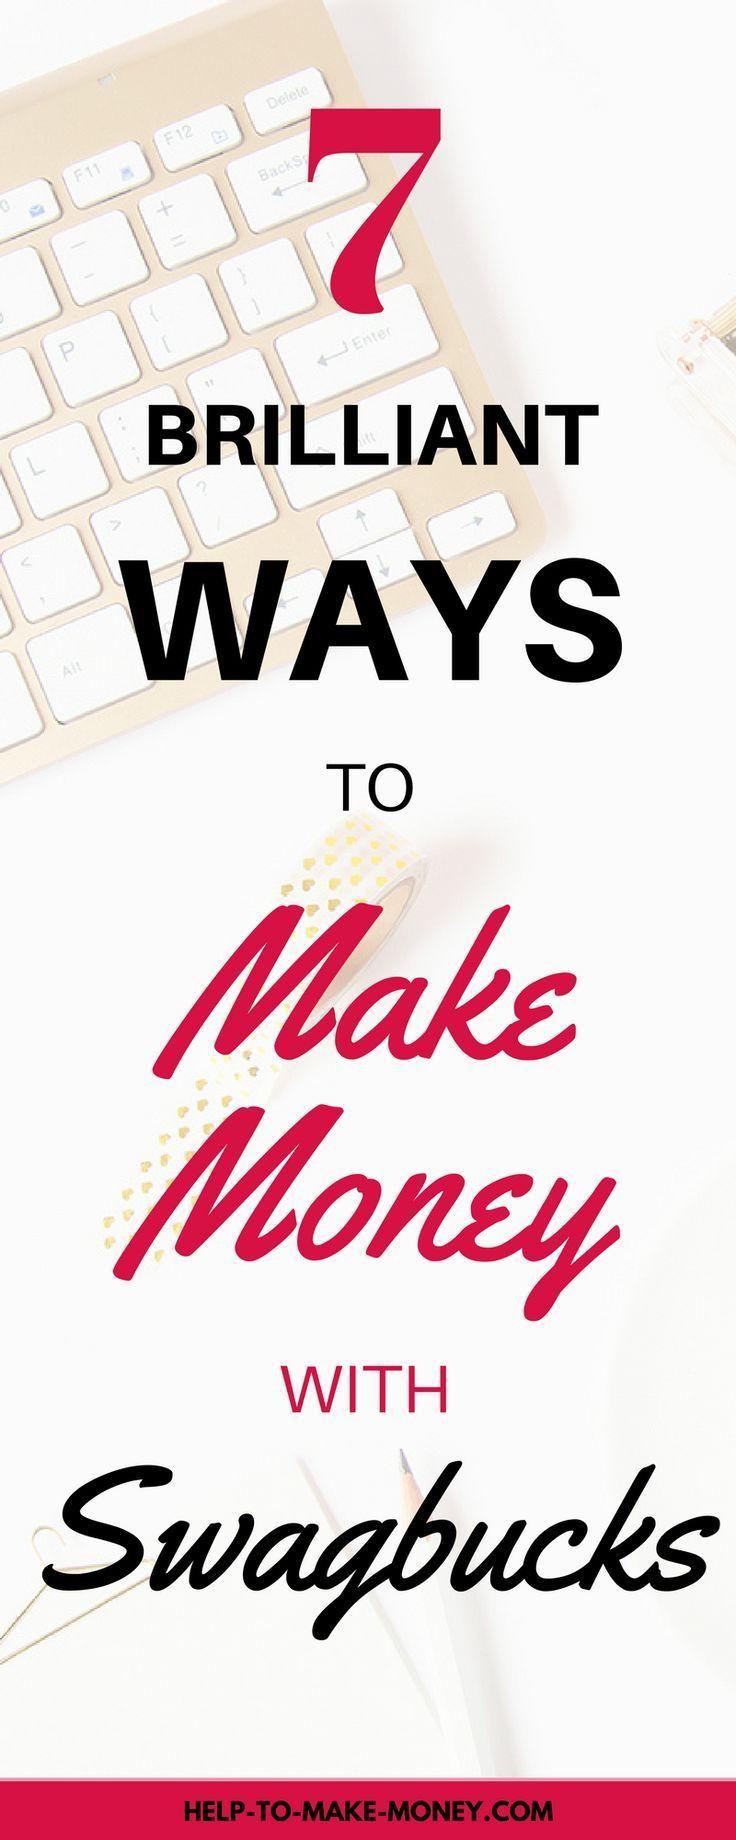 7 Brilliant Ways to Make Money with Swagbucks! | Pinterest | Cash ...